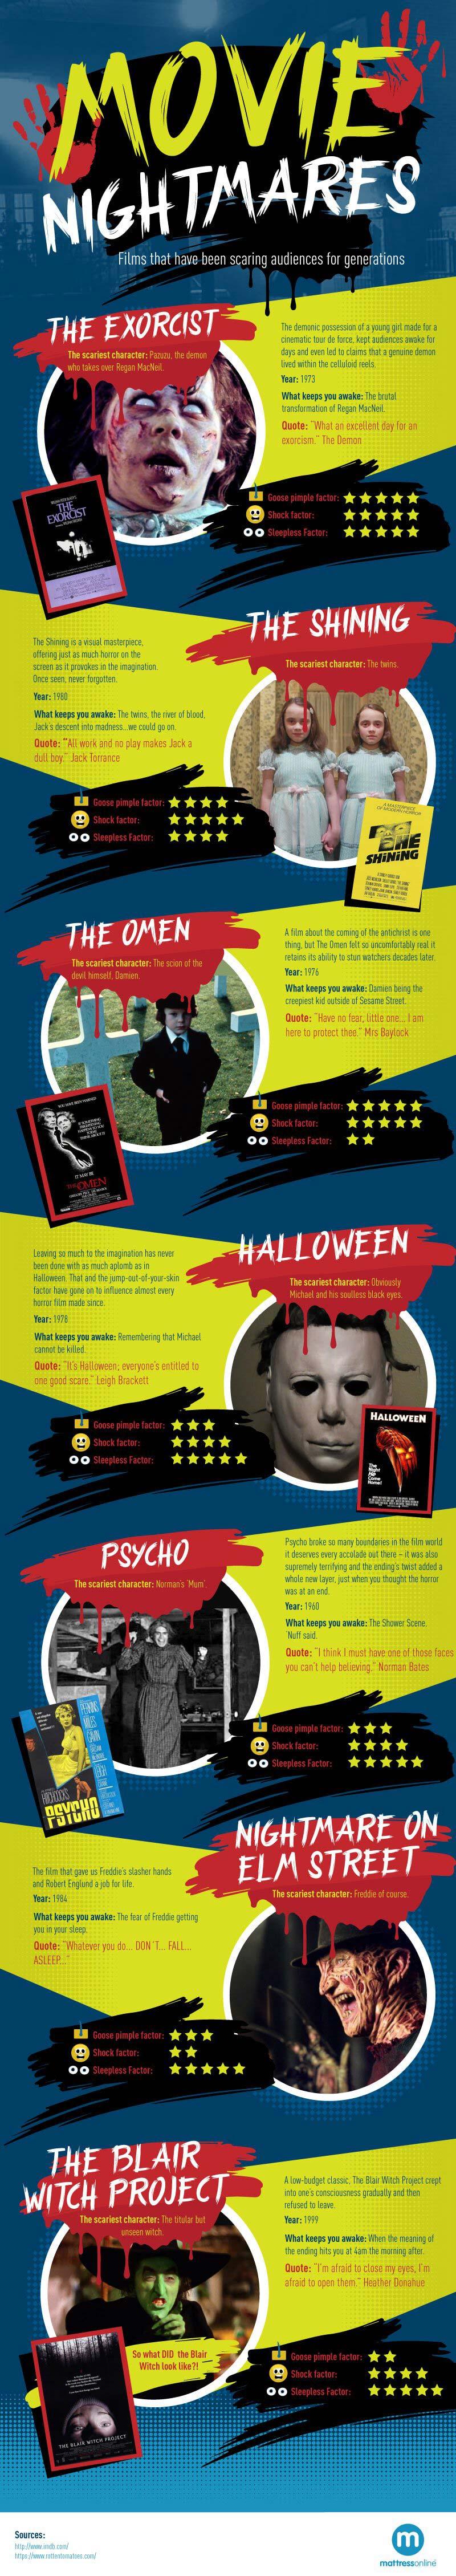 movie-nightmares-infographic-full